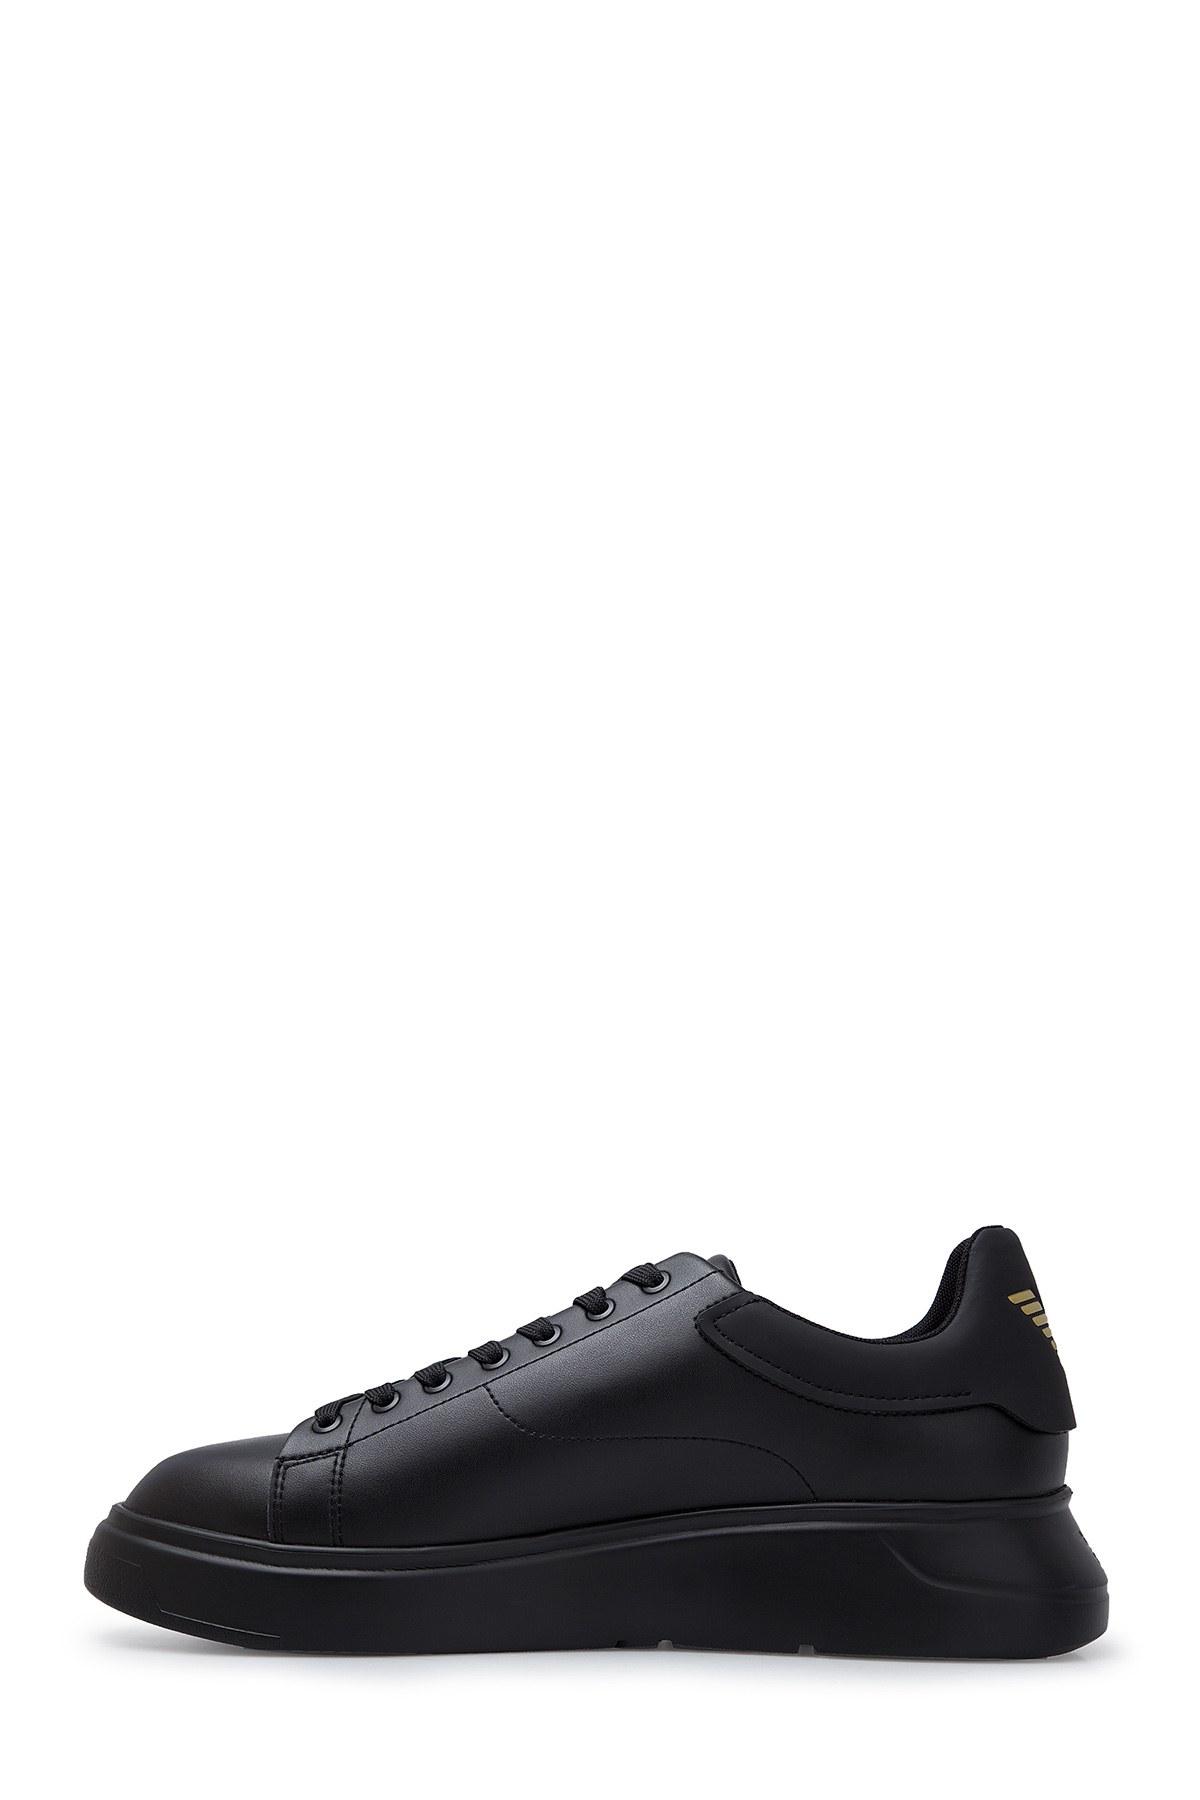 Emporio Armani Erkek Ayakkabı X4X264 XM321 K001 SİYAH-SİYAH